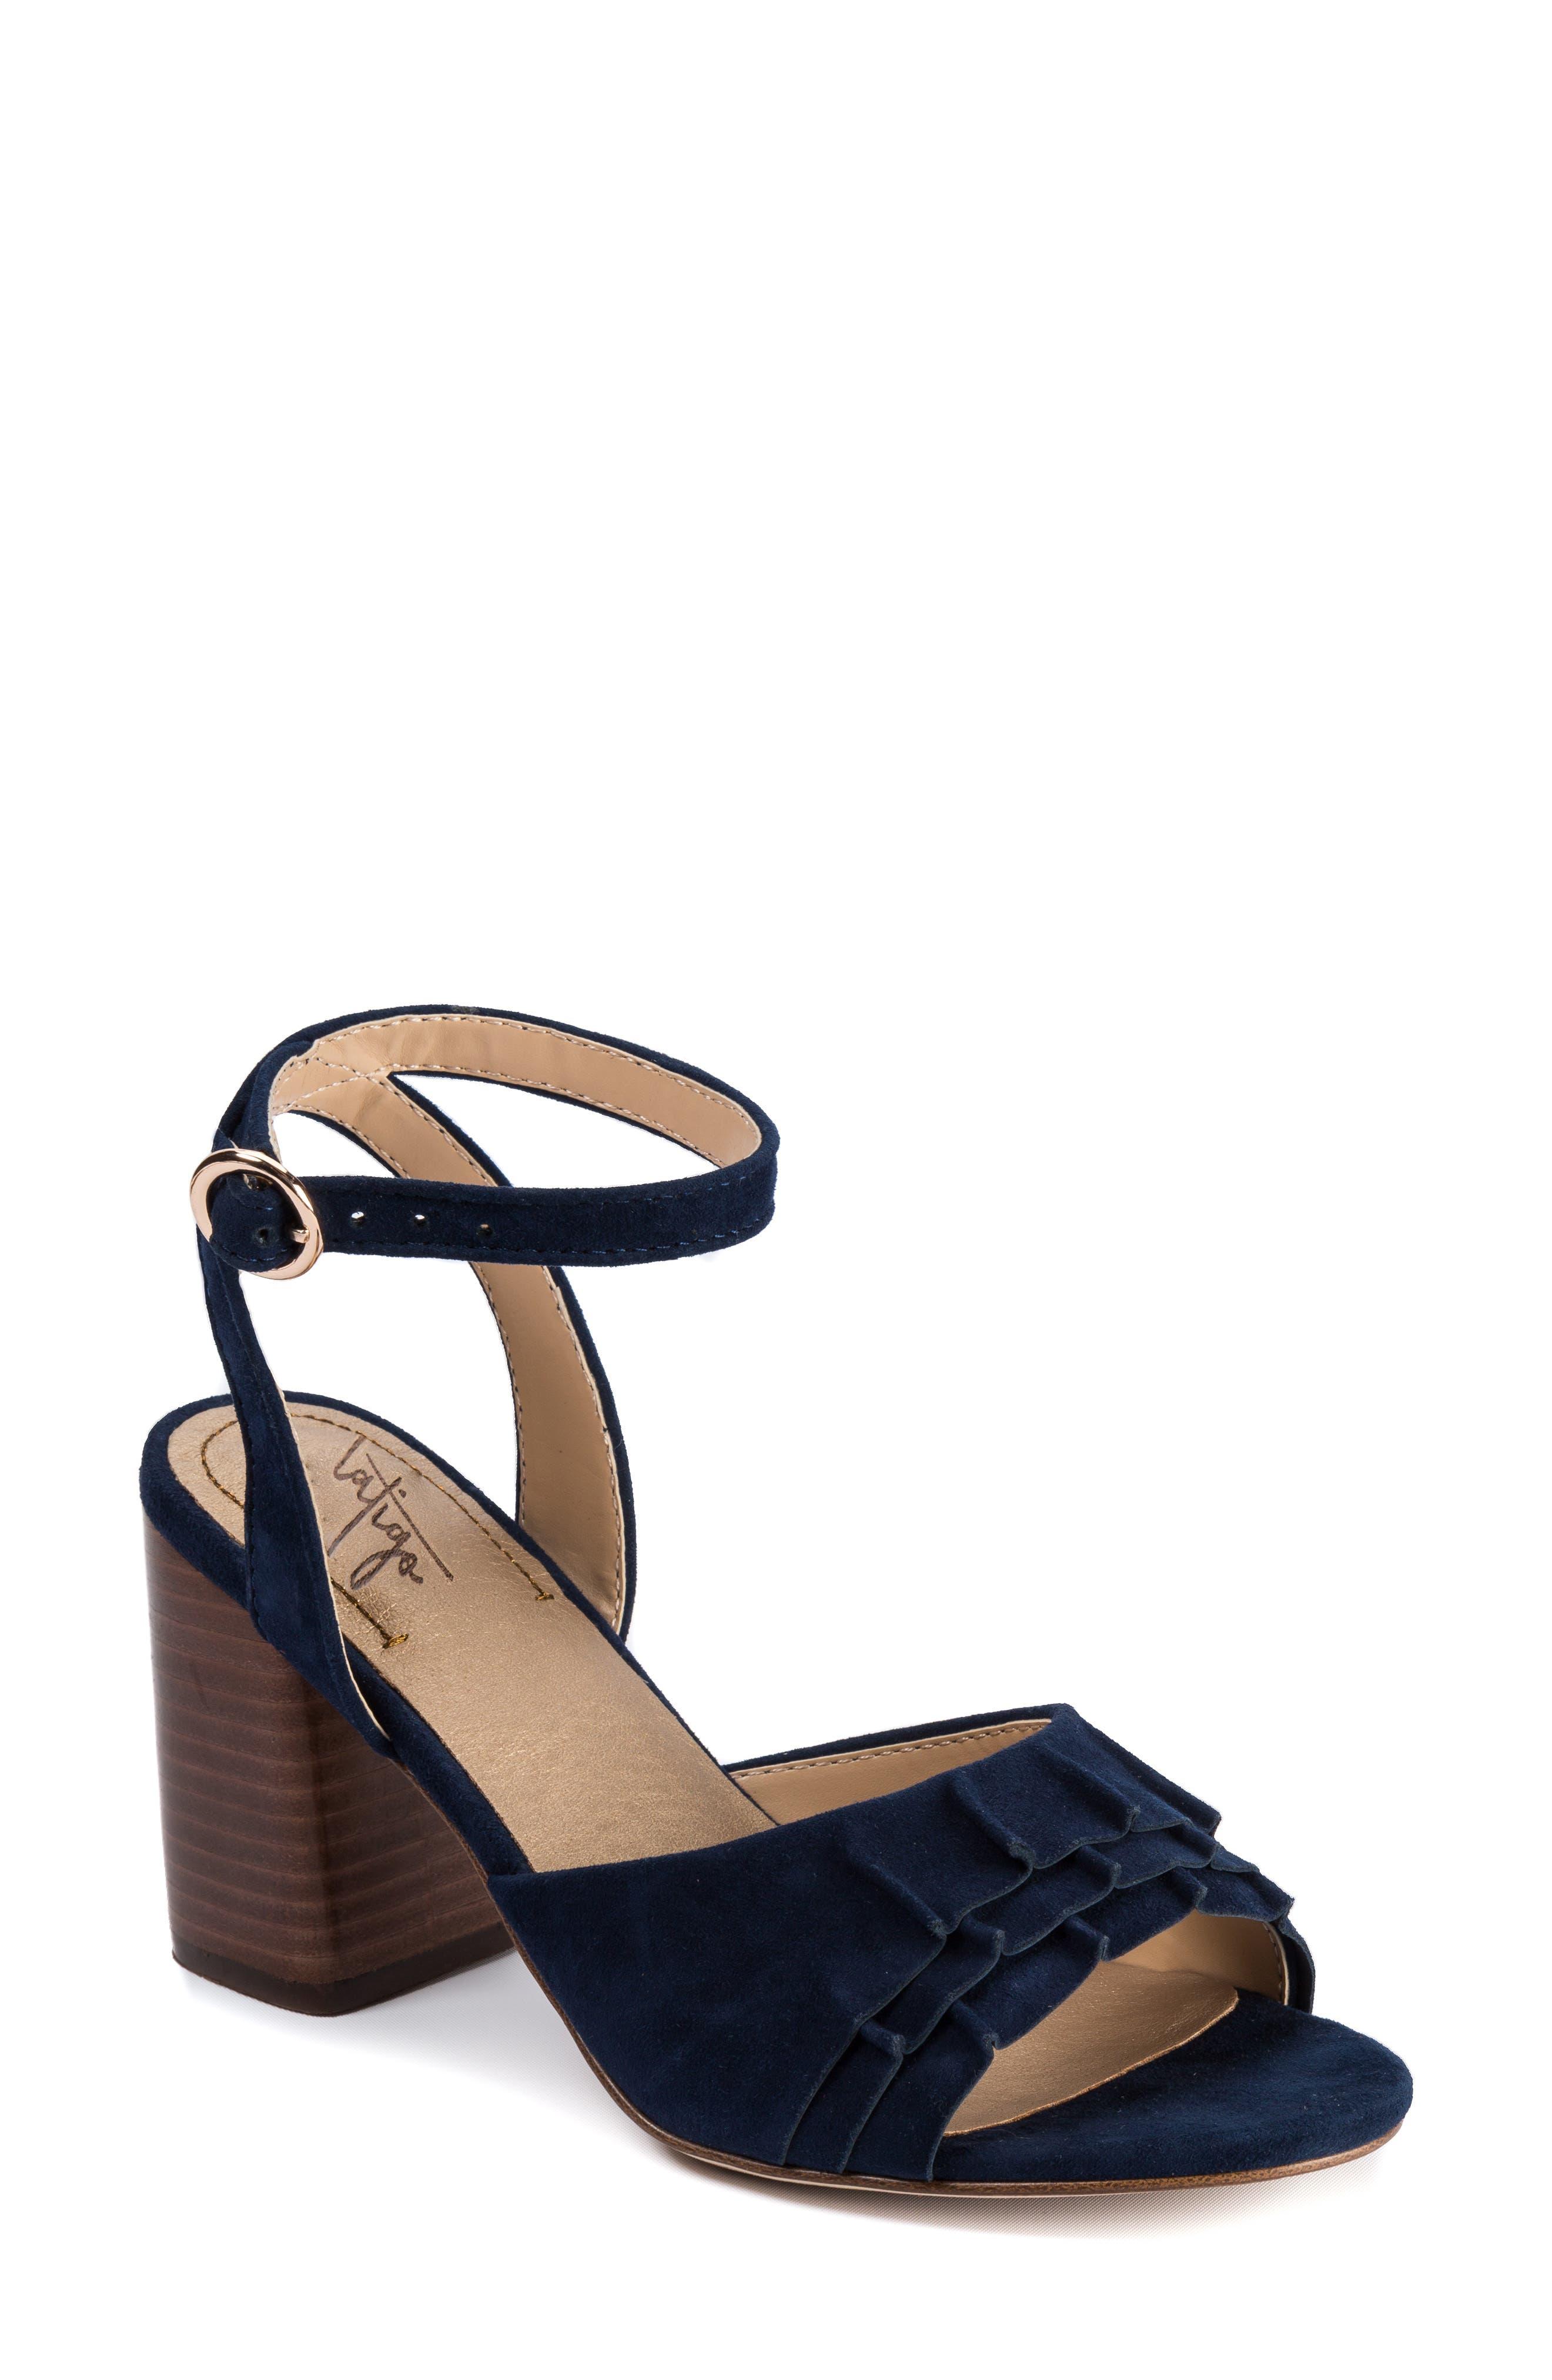 LATIGO, Idelle Ankle Strap Sandal, Main thumbnail 1, color, 410